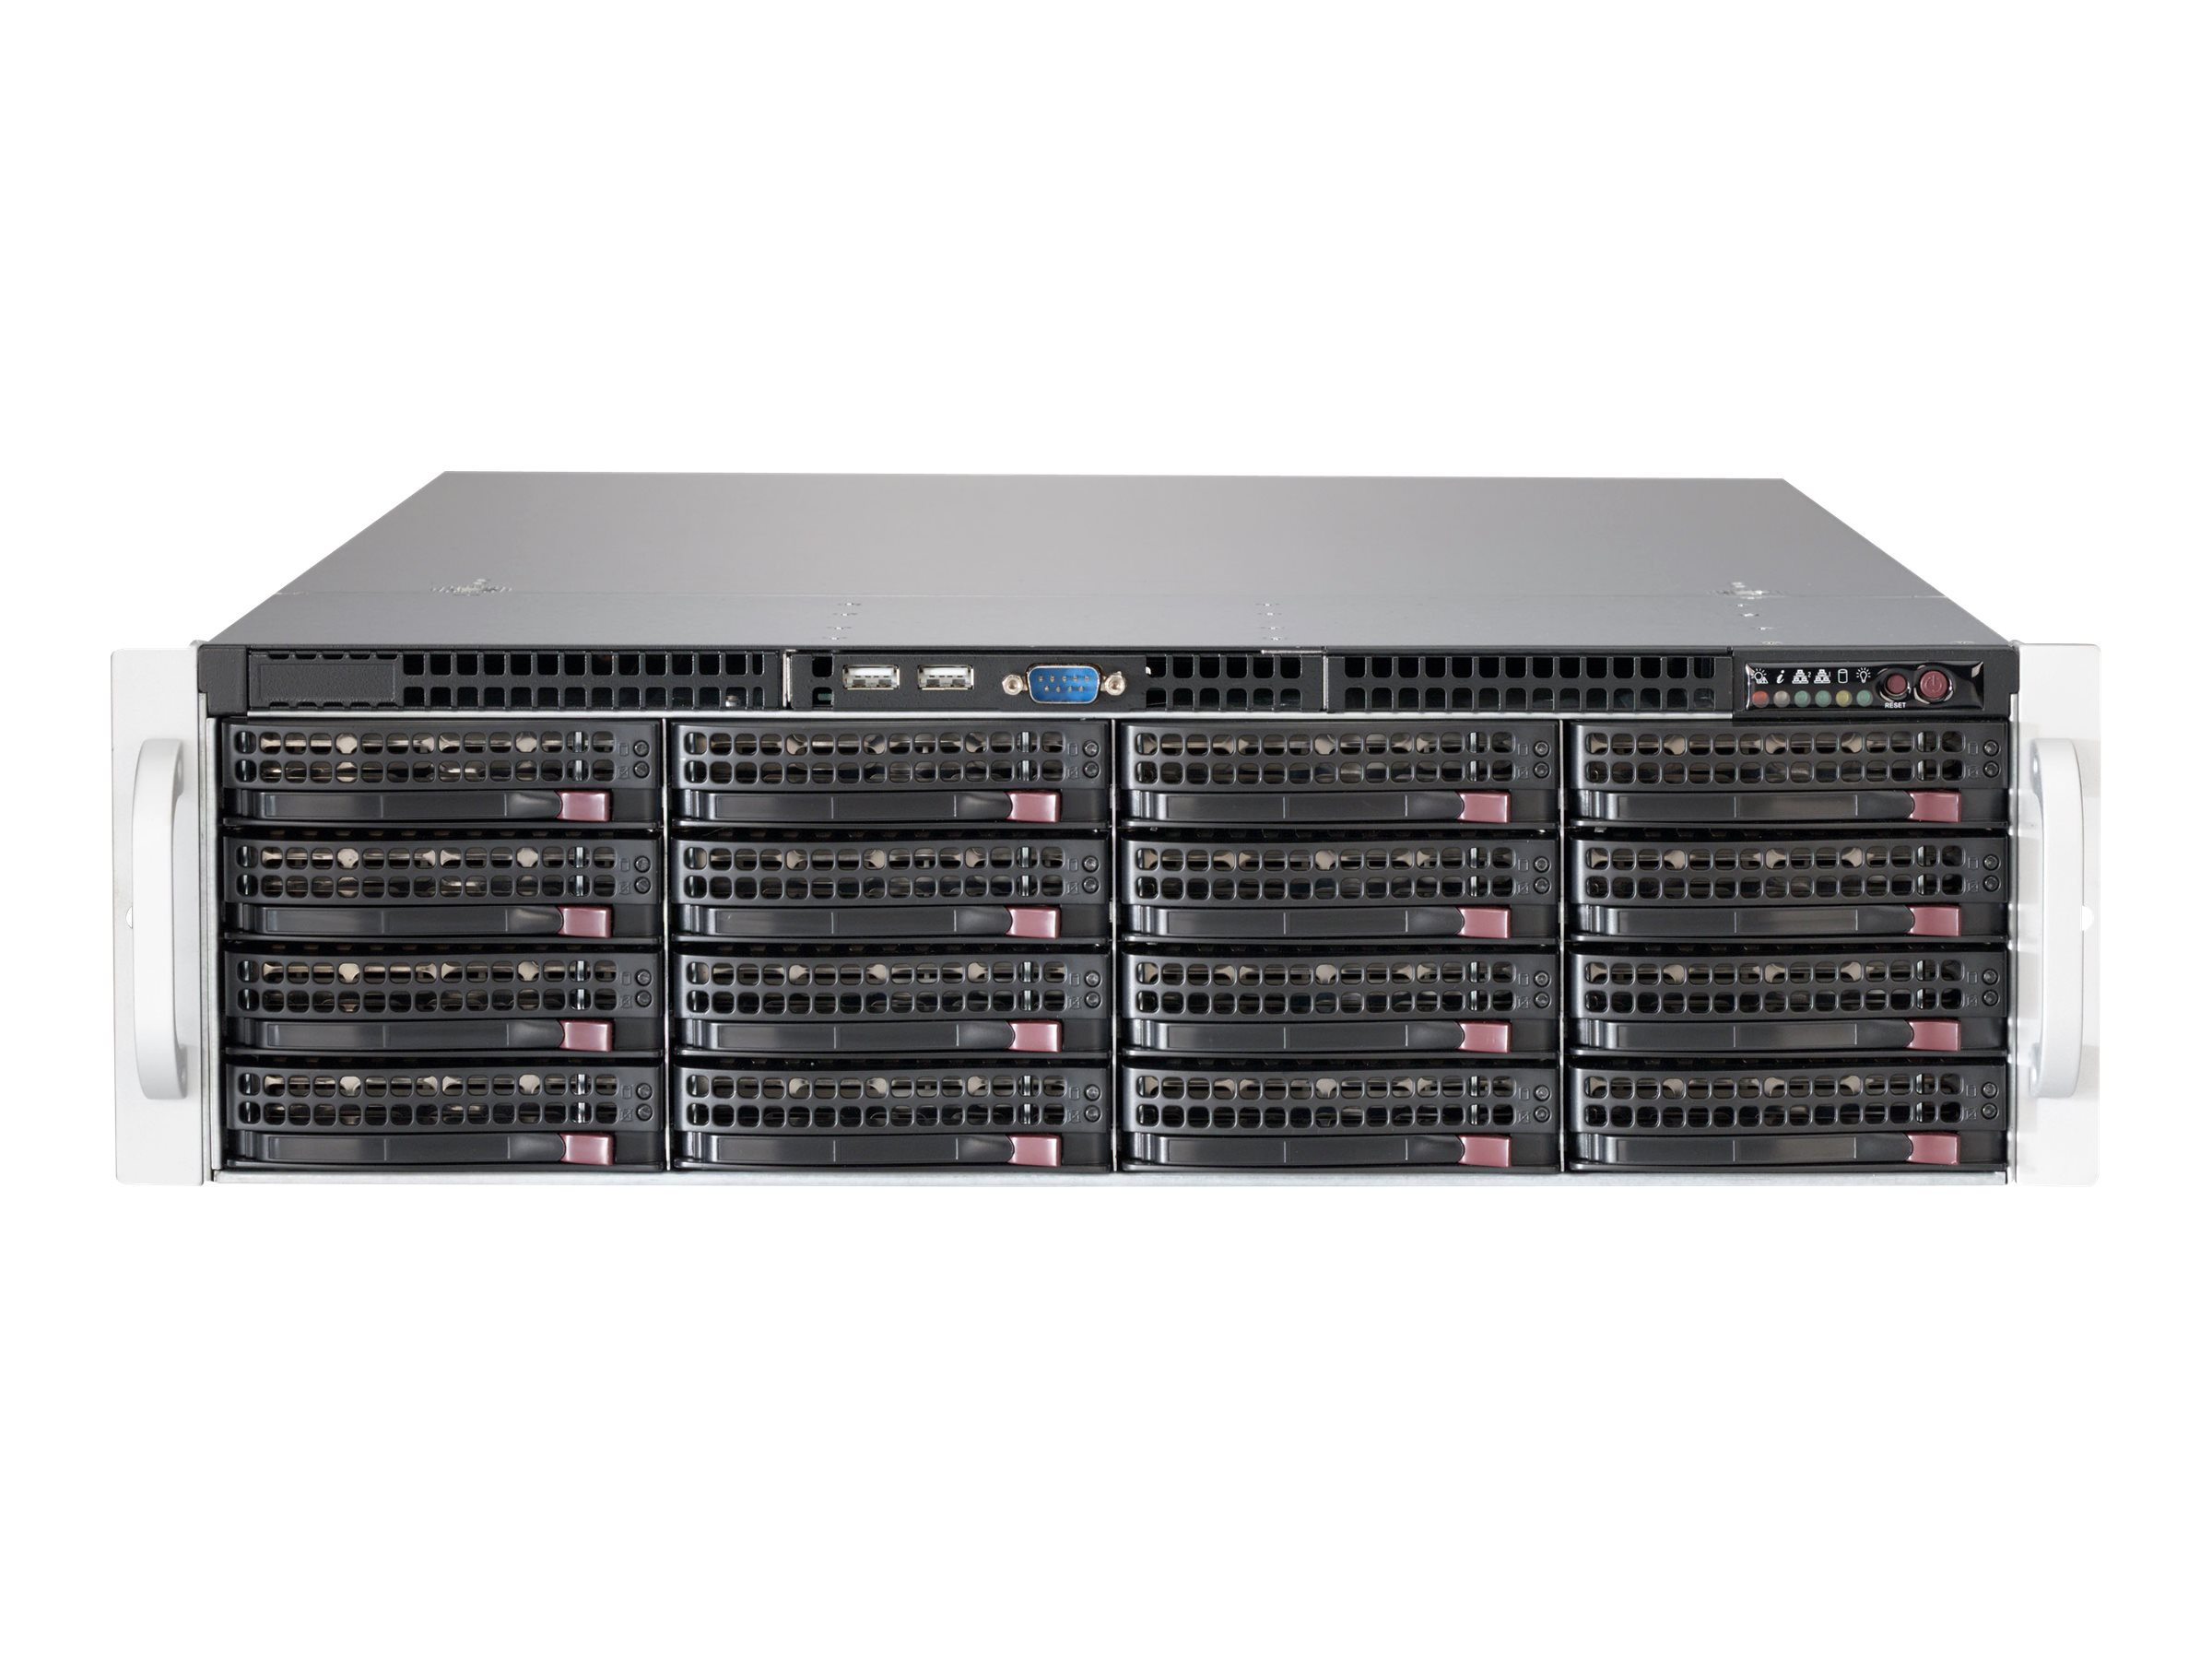 Supermicro SC836 BE2C-R1K03JBOD - Rack - einbaufähig - 3U - SATA/SAS - Hot-Swap 1000 Watt